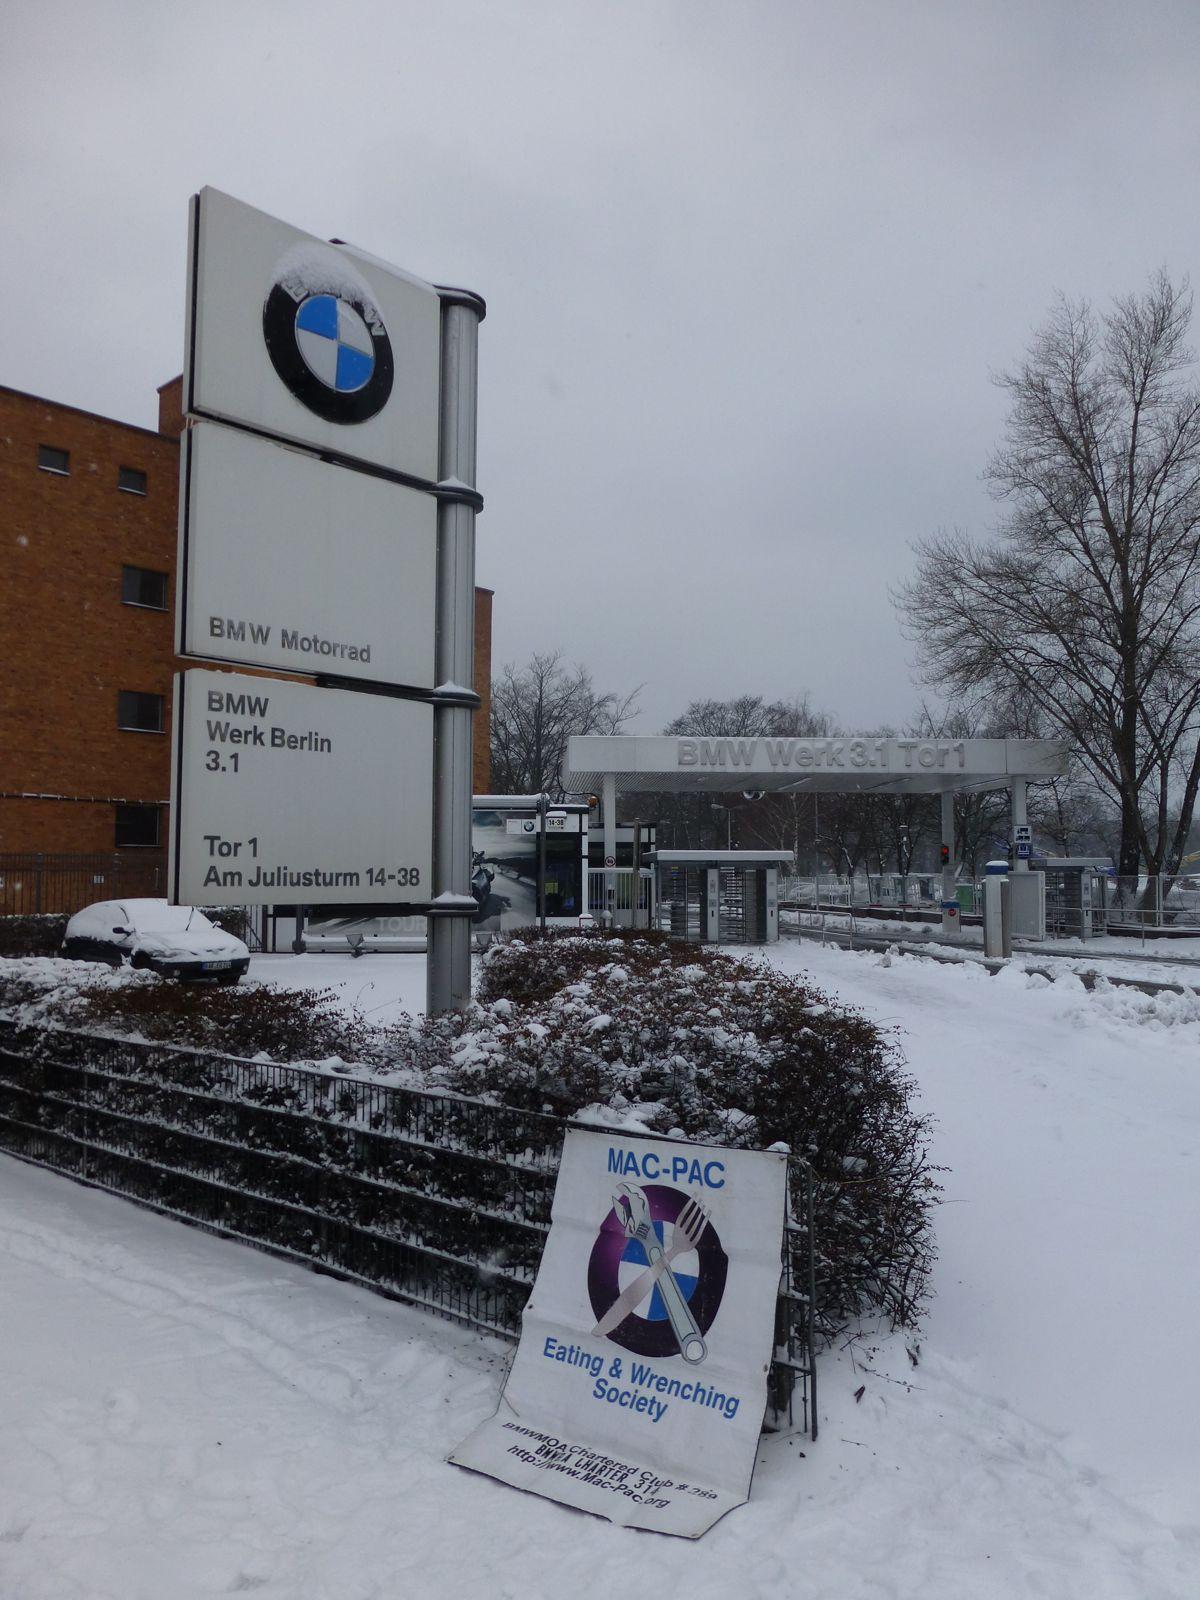 BMW Motorad Factory - BMW Werk 3.1 Berlin